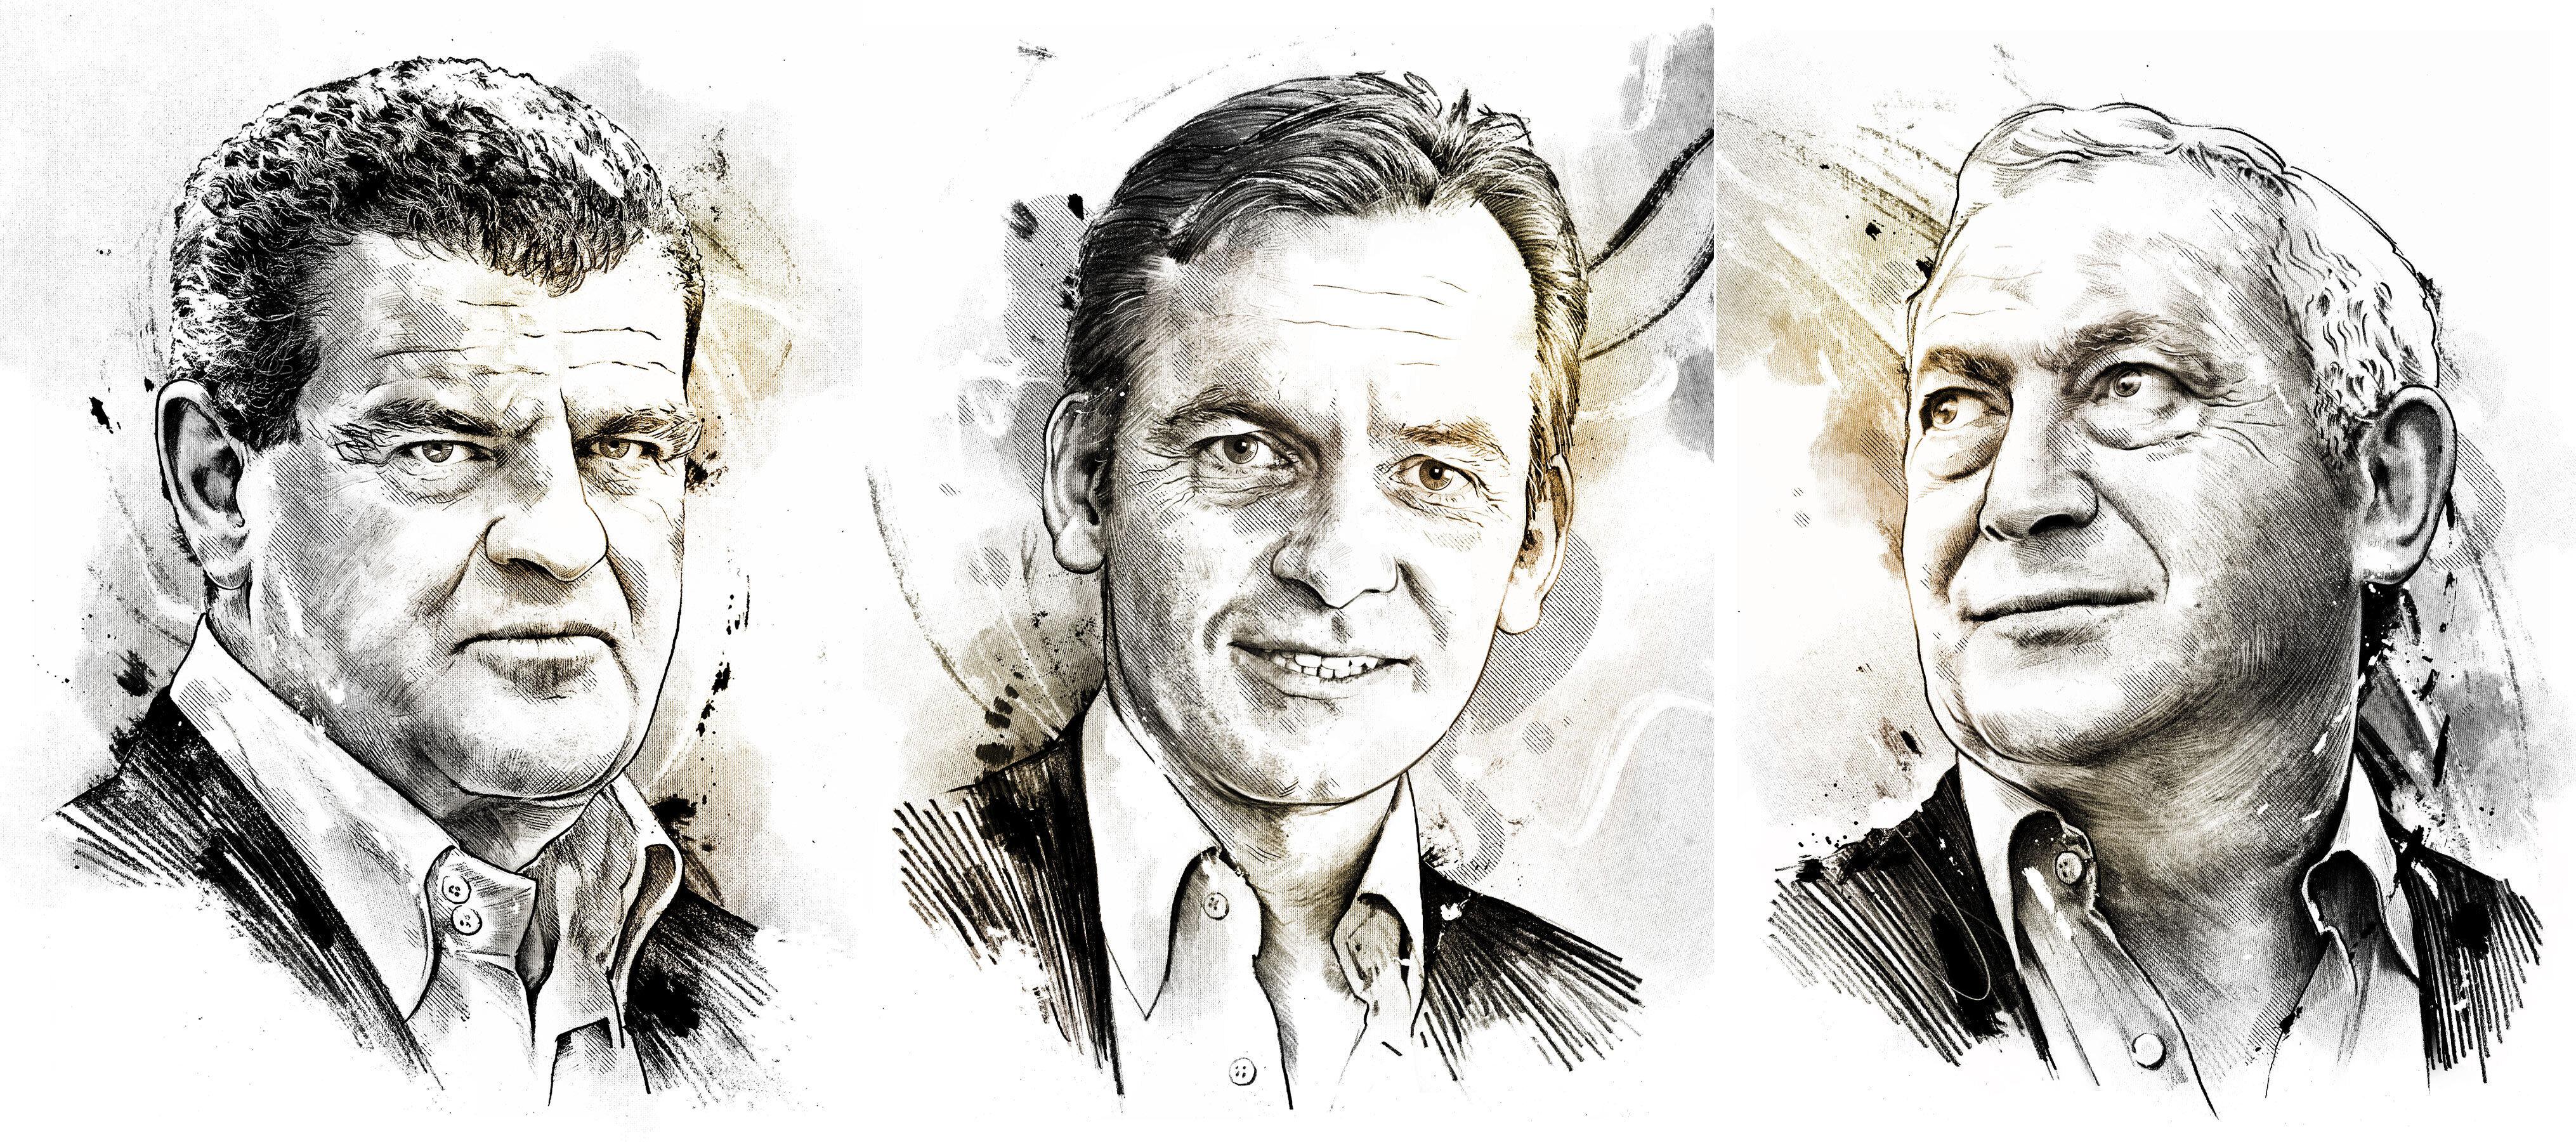 Portraits portrait illustration editorial portraitdrawing 1 - Kornel Illustration | Kornel Stadler portfolio